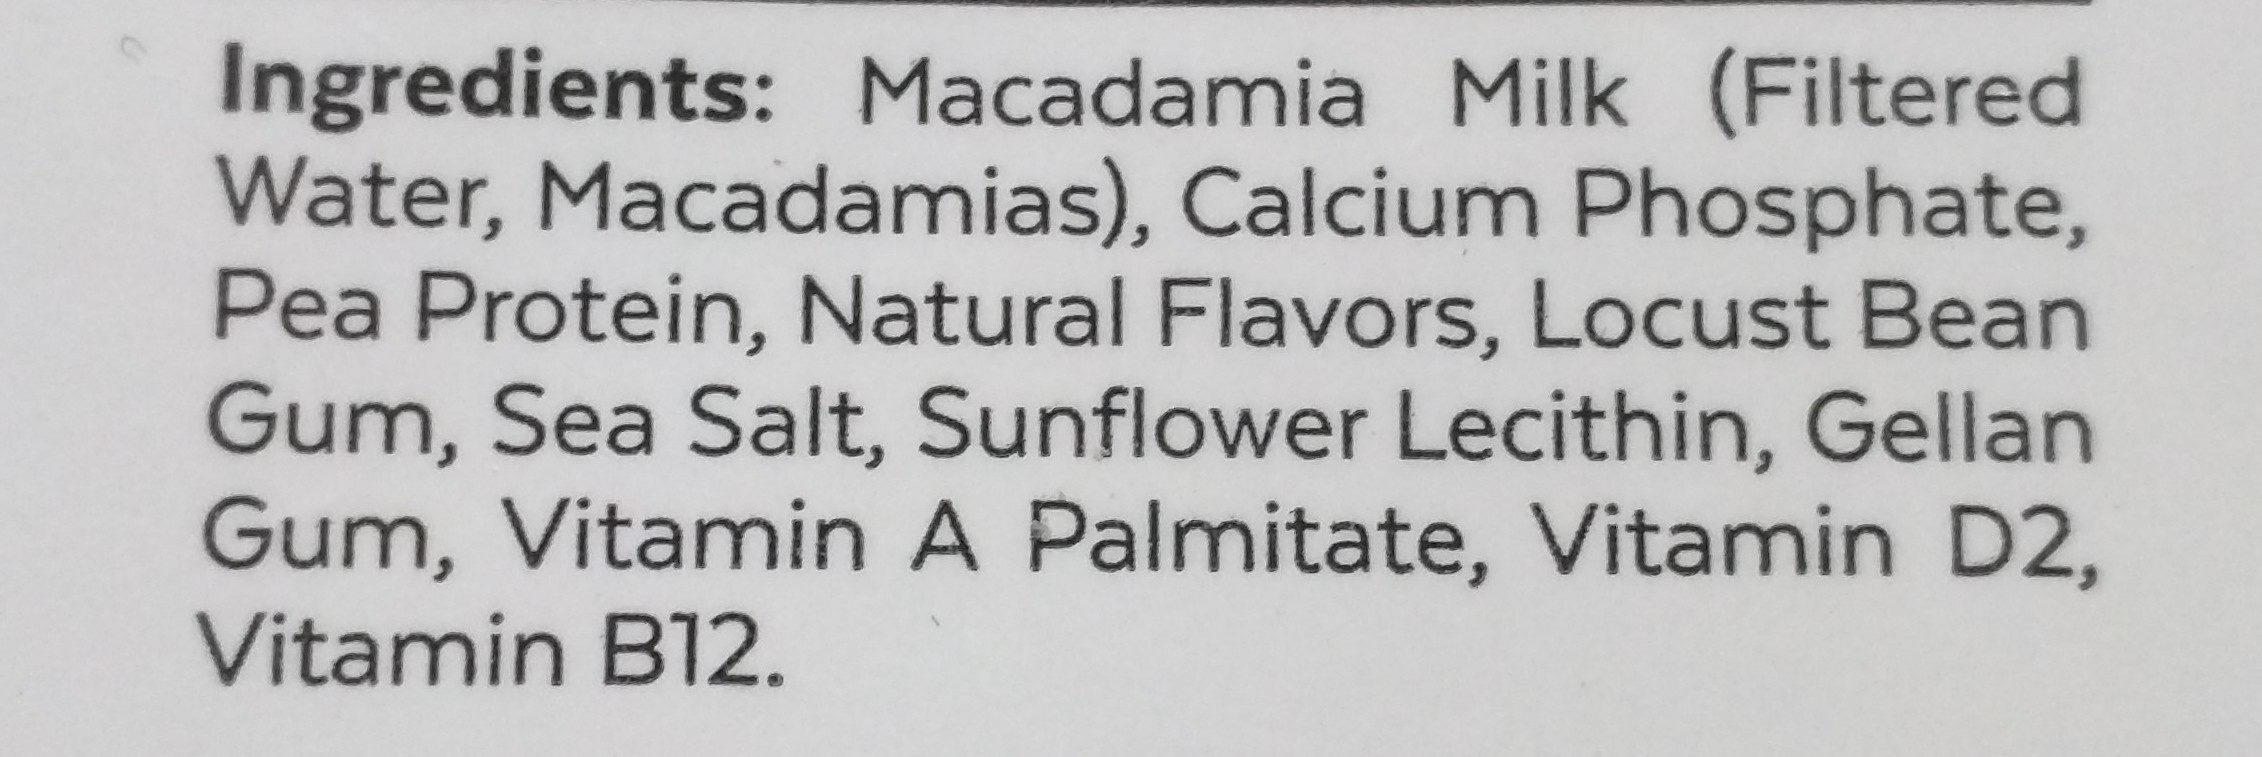 Milk macadamia unsweetned - Ingredients - en